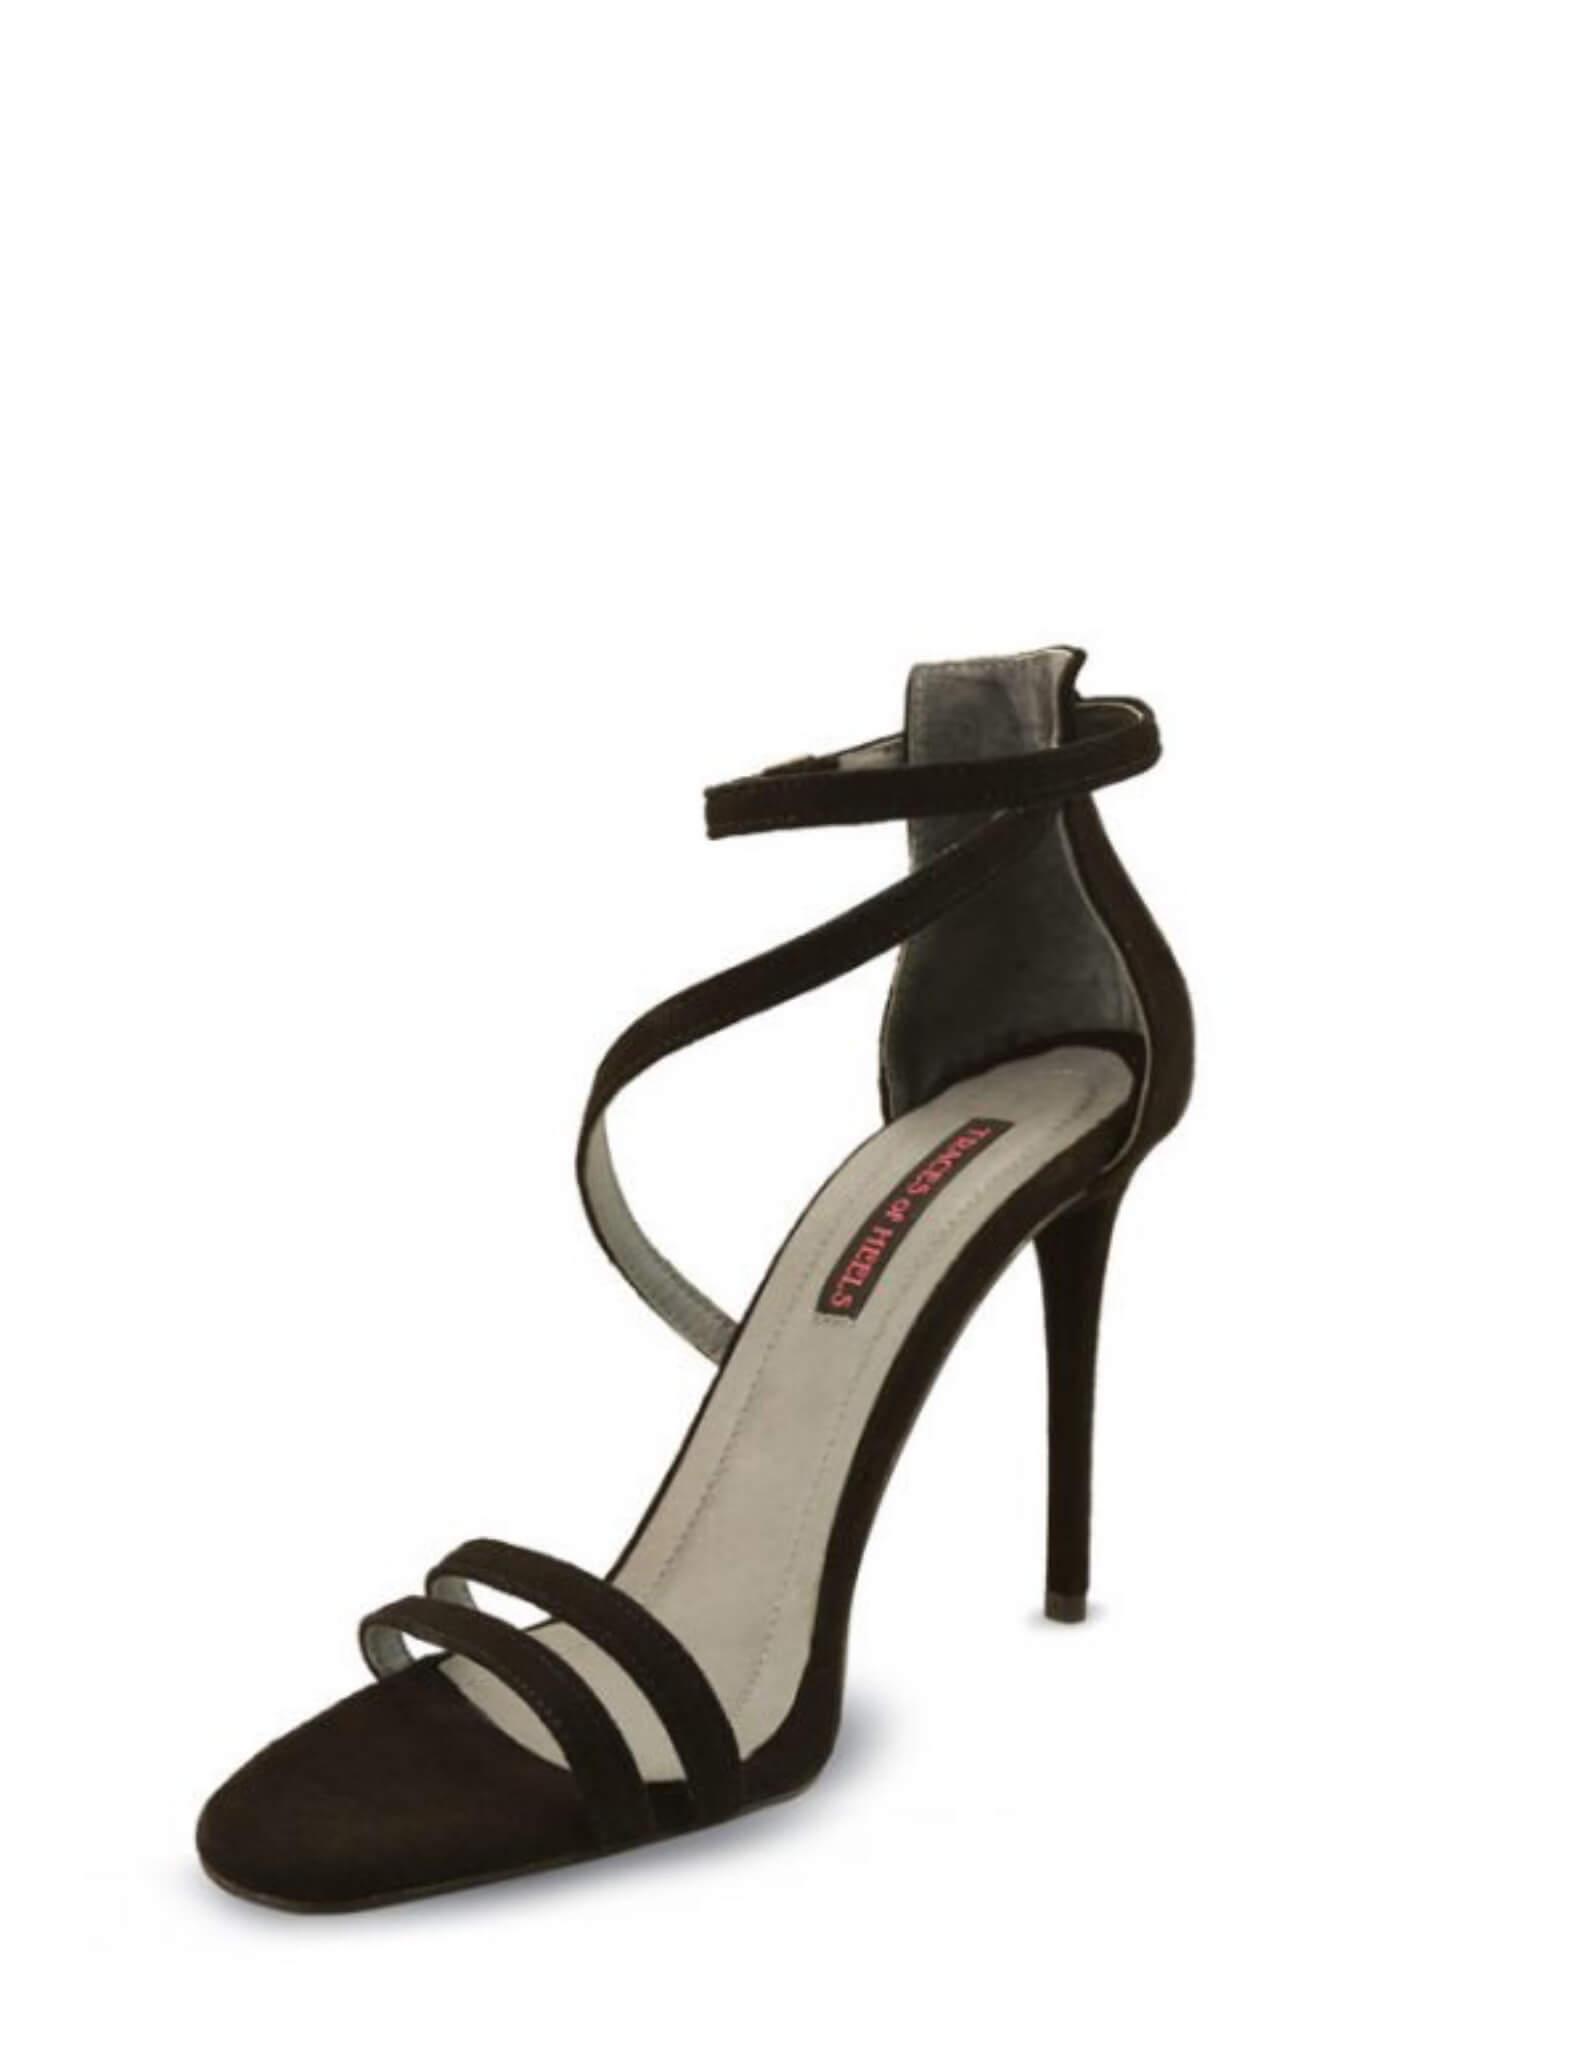 Sandale piele neagra MIRROR MIRROR ON THE WALL